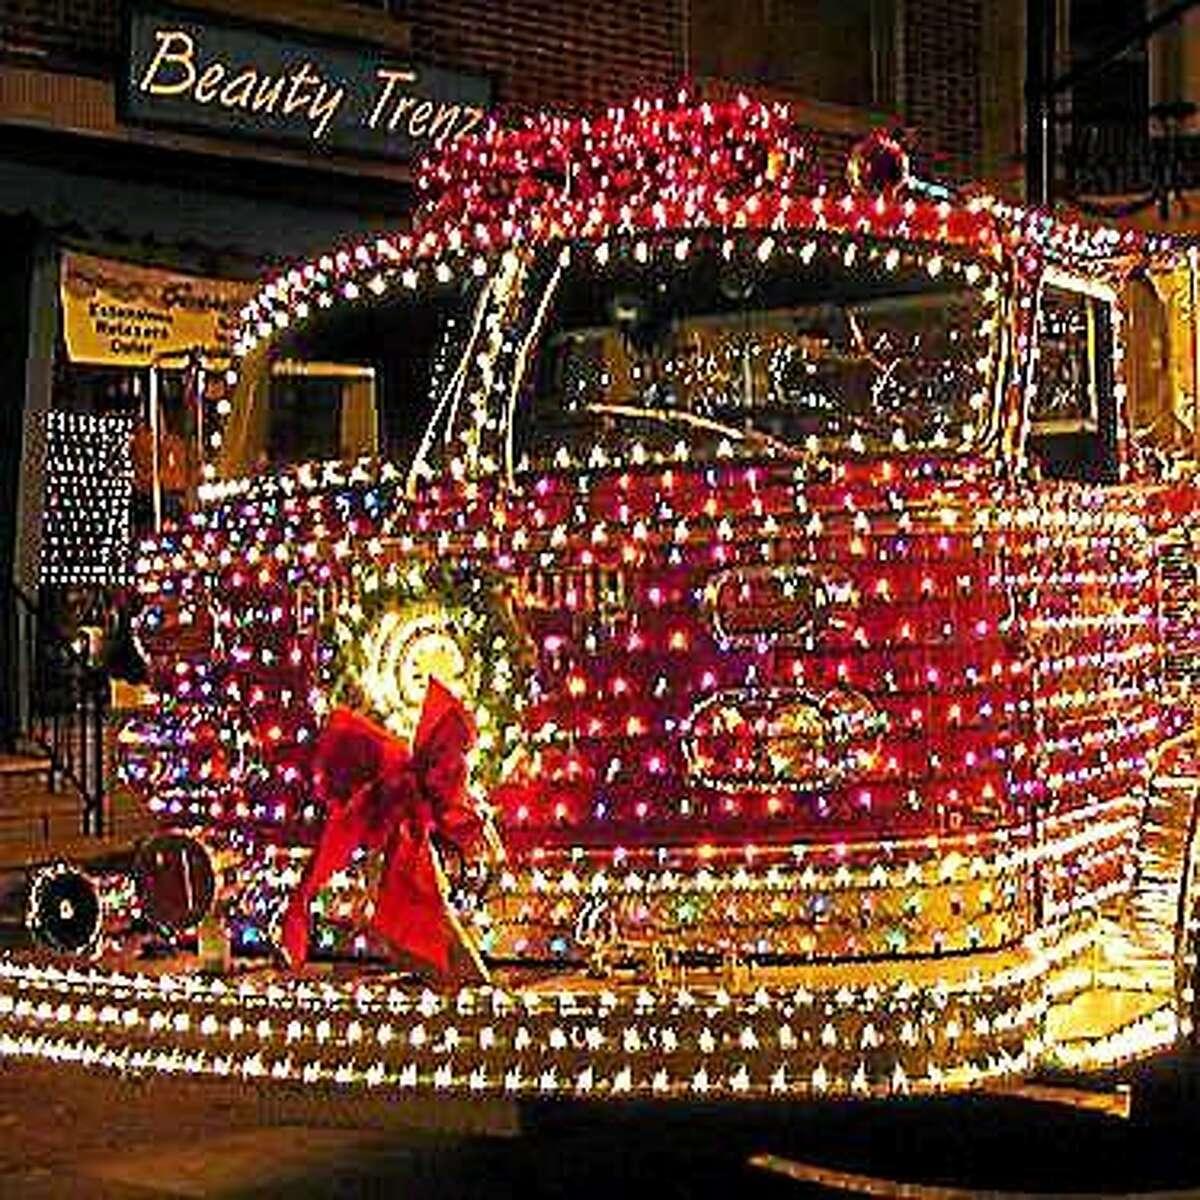 Portland's holiday light parade and tree lighting takes place Sunday.